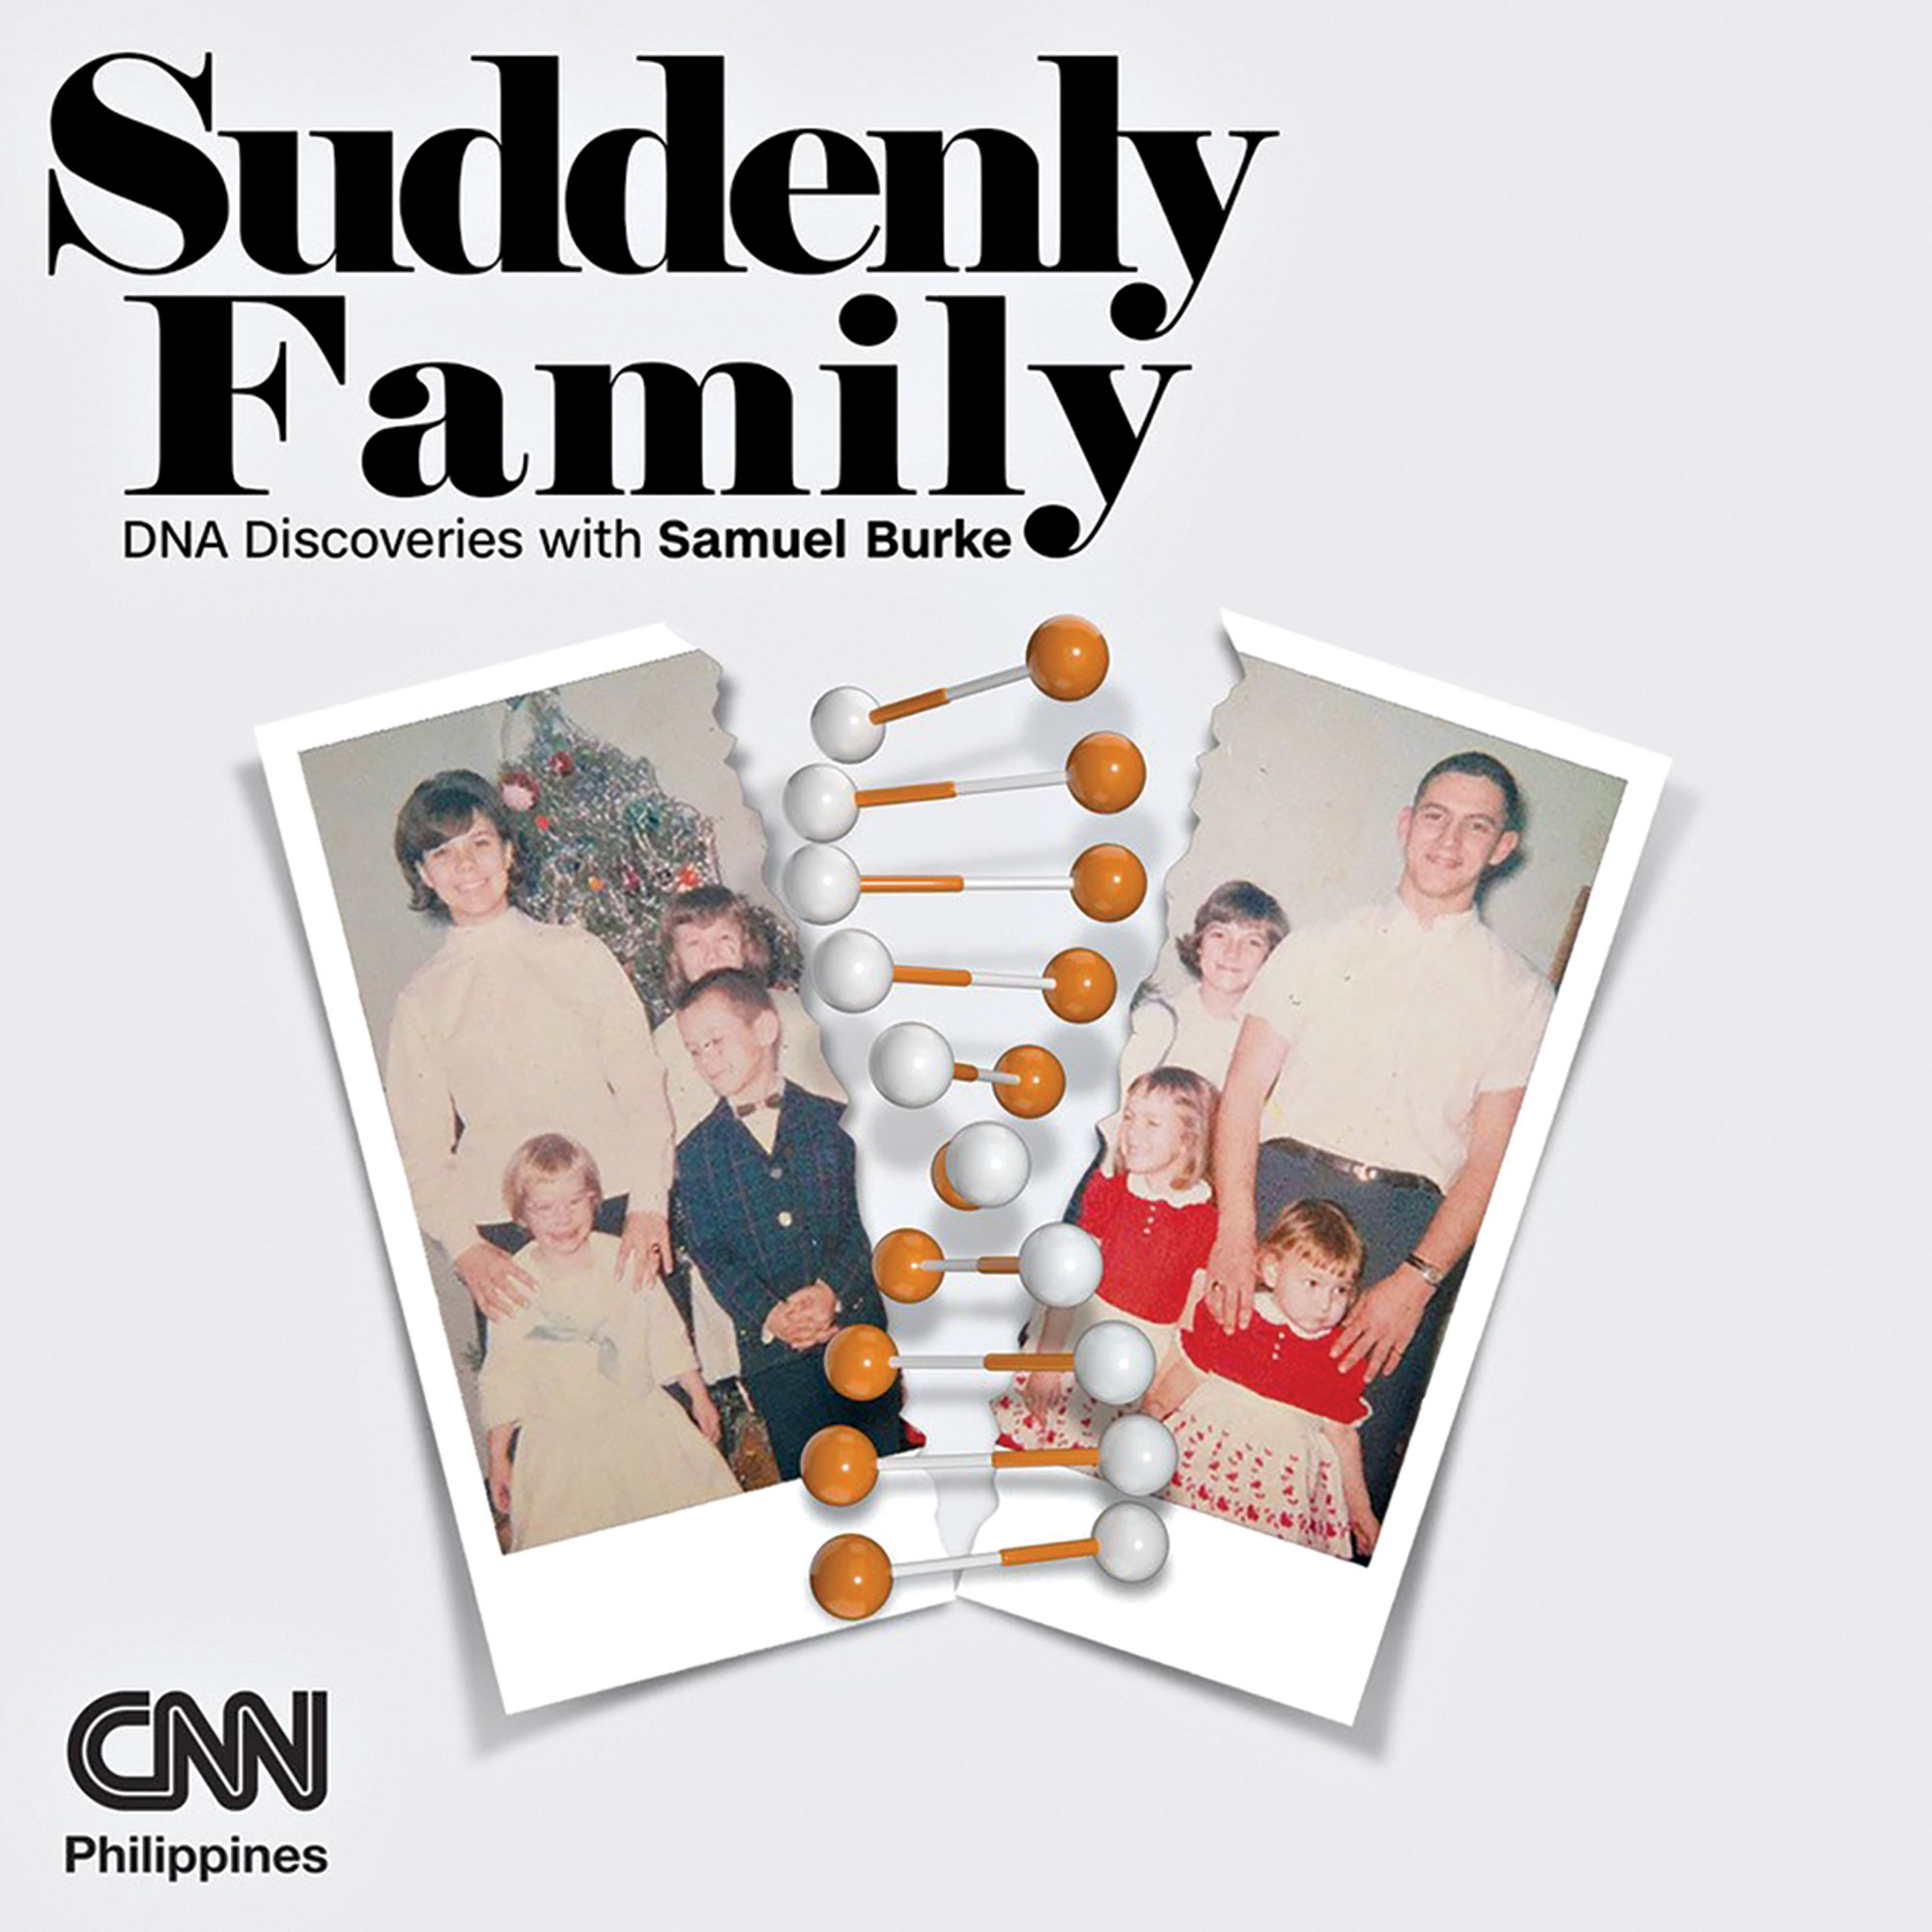 Photo courtesy CNN Philippines